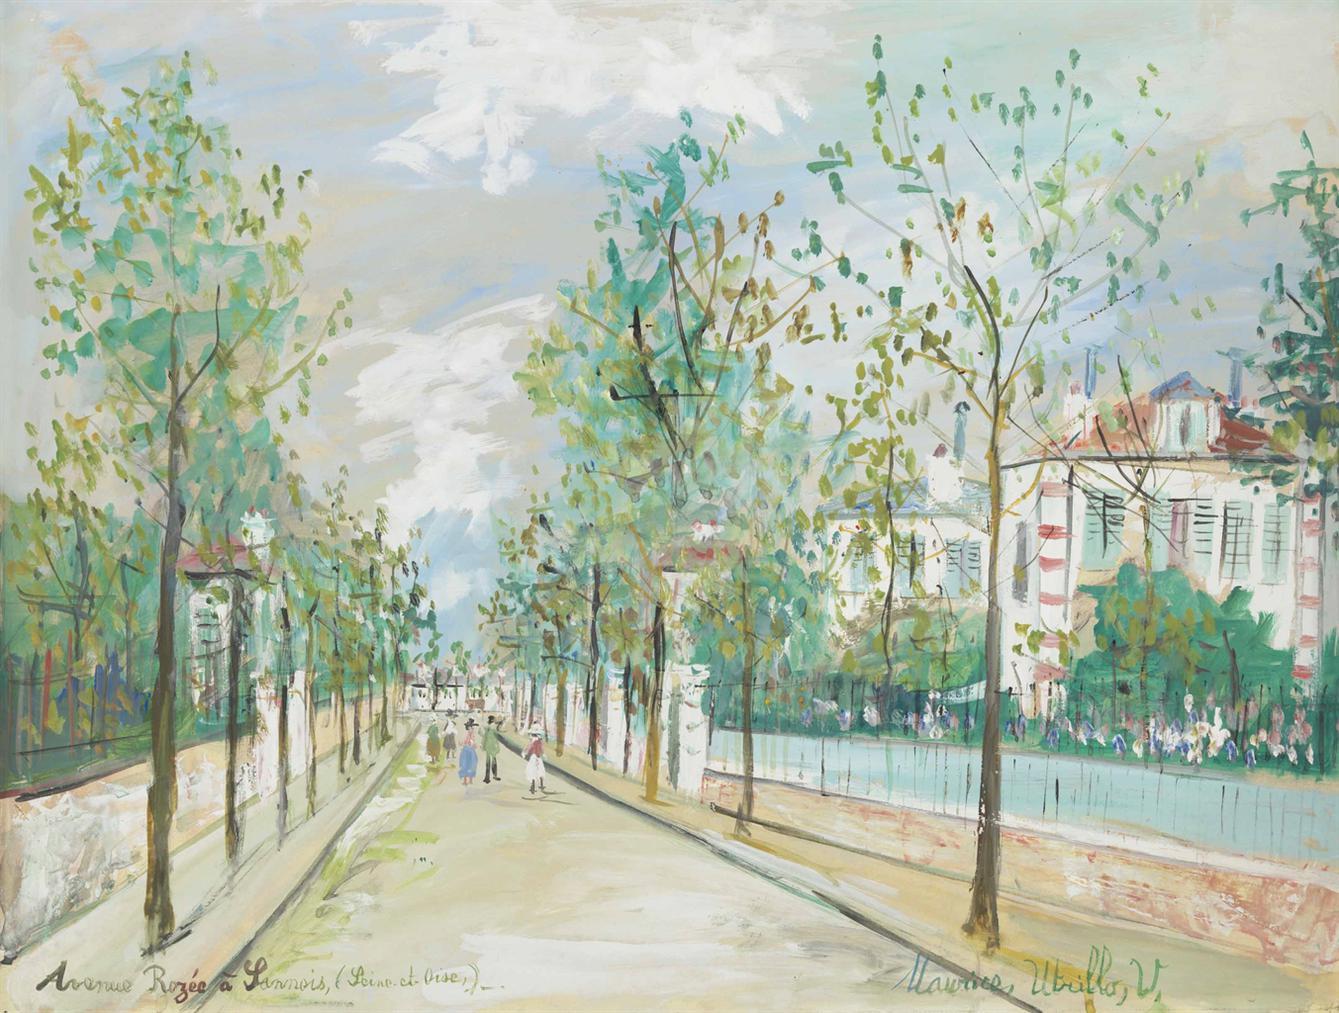 Maurice Utrillo-Avenue Rozee, Sannois (Val-Doise)-1938